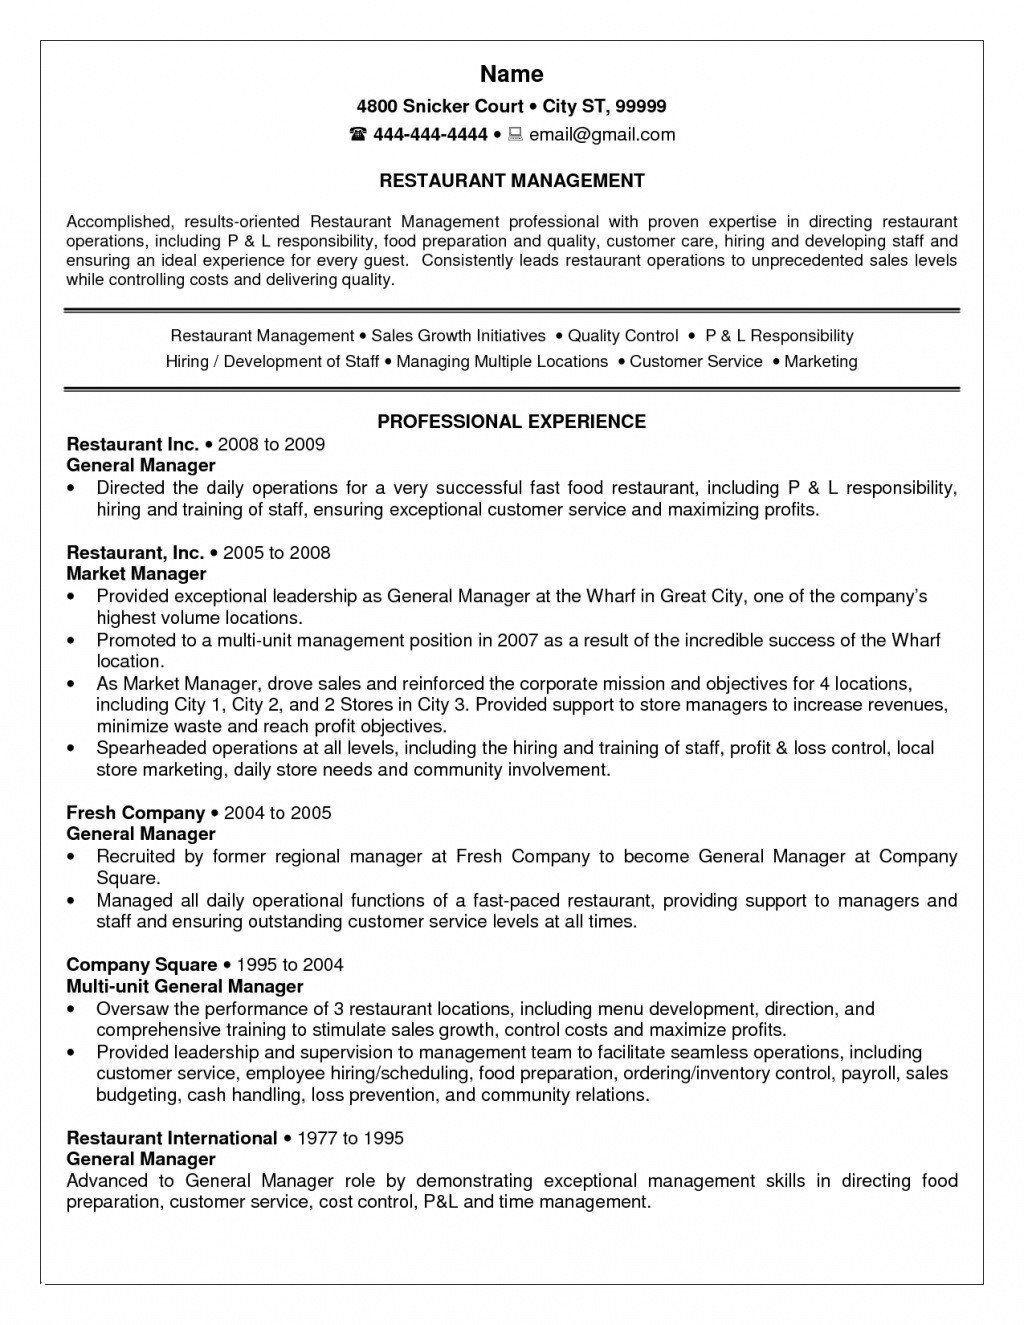 Resume Skills For Customer Service Manager